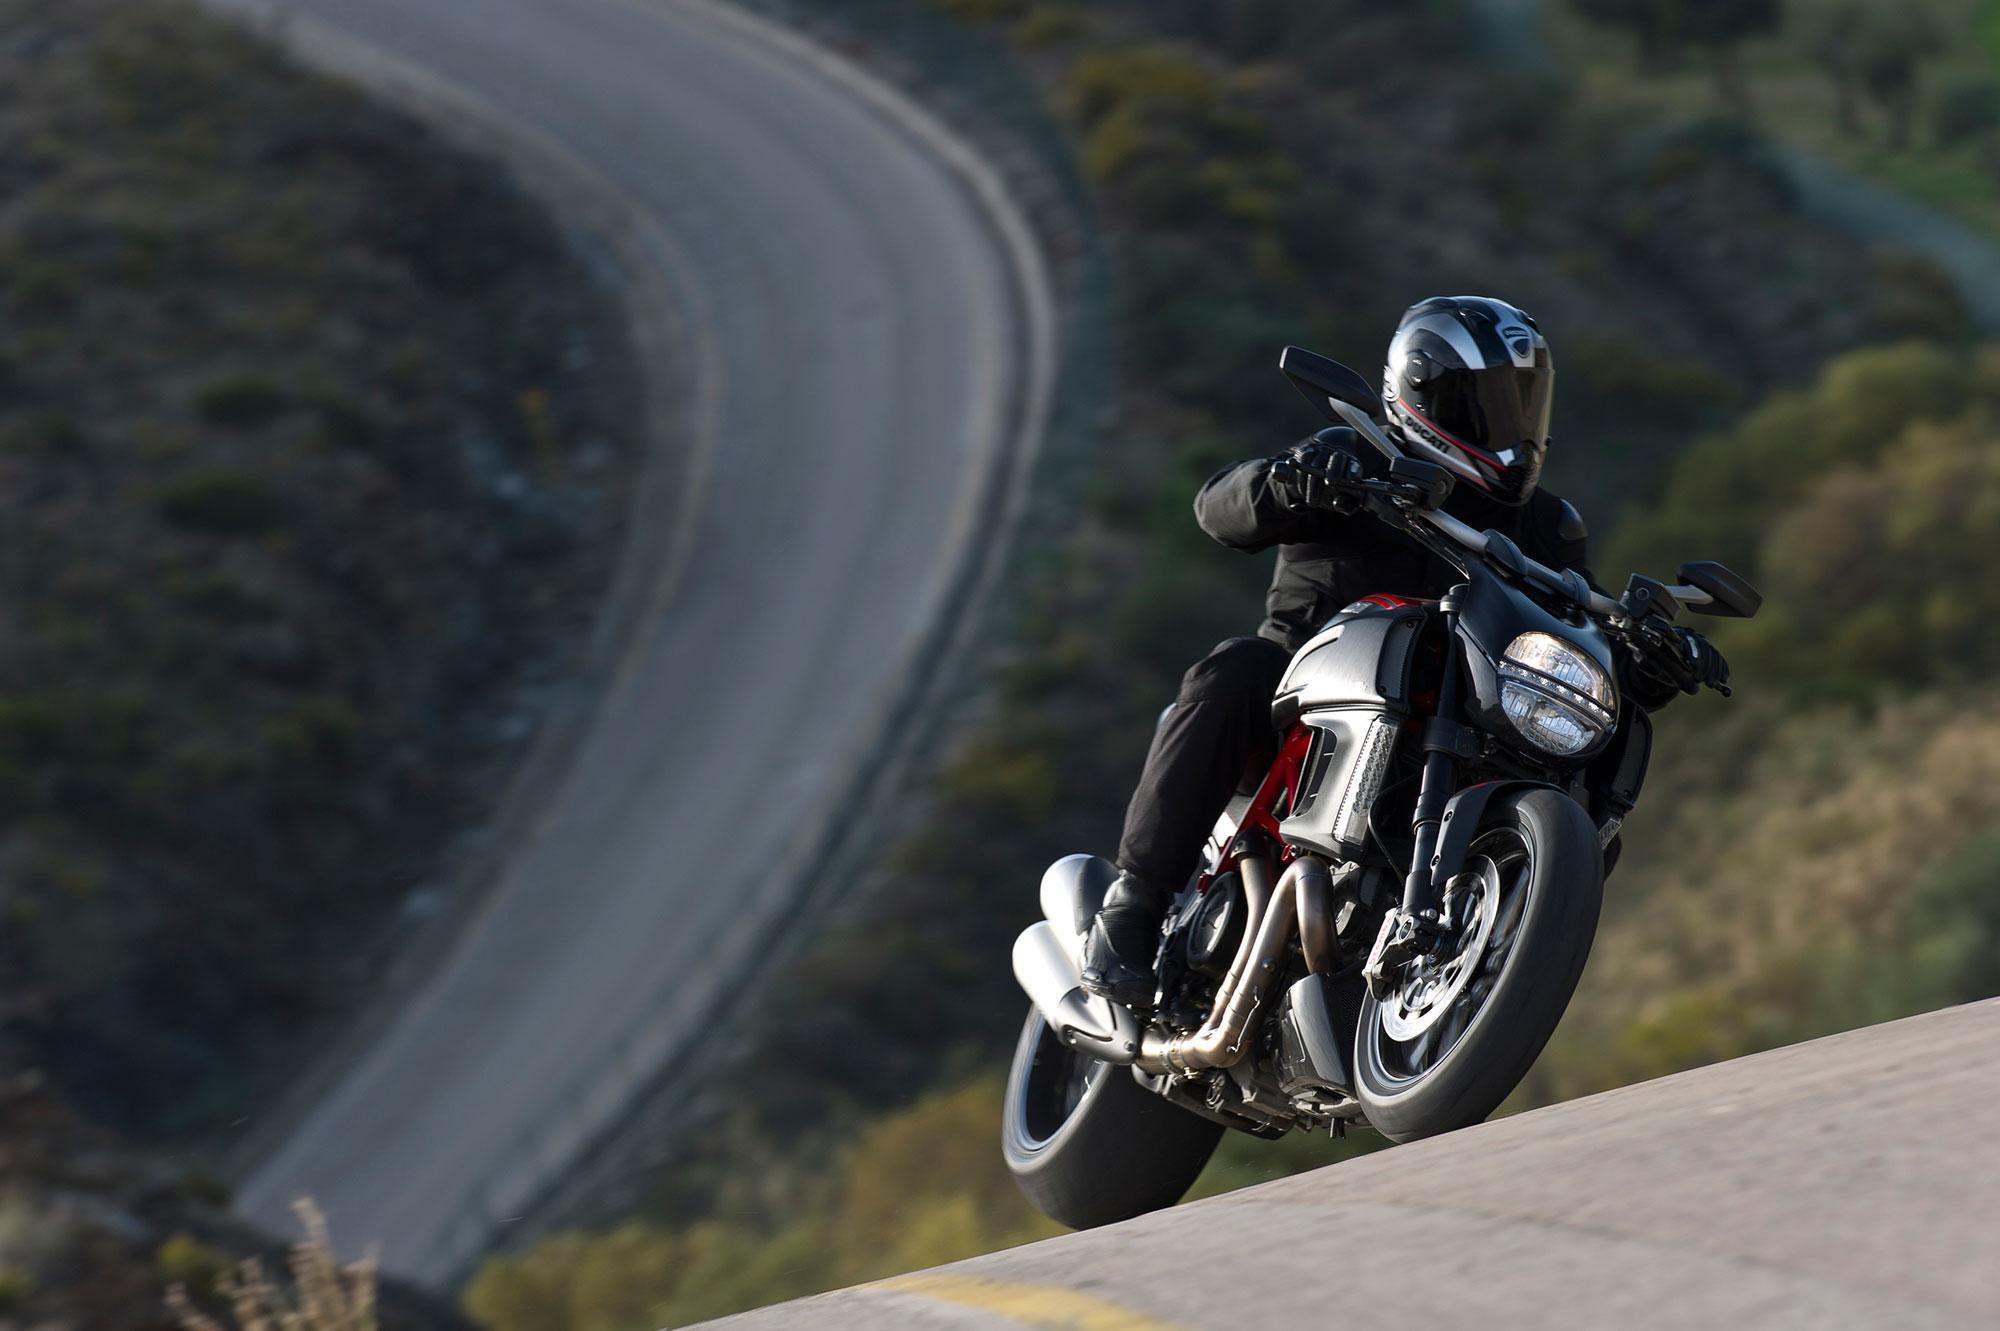 2013 Ducati Diavel Carbon q wallpaper background 2000x1331